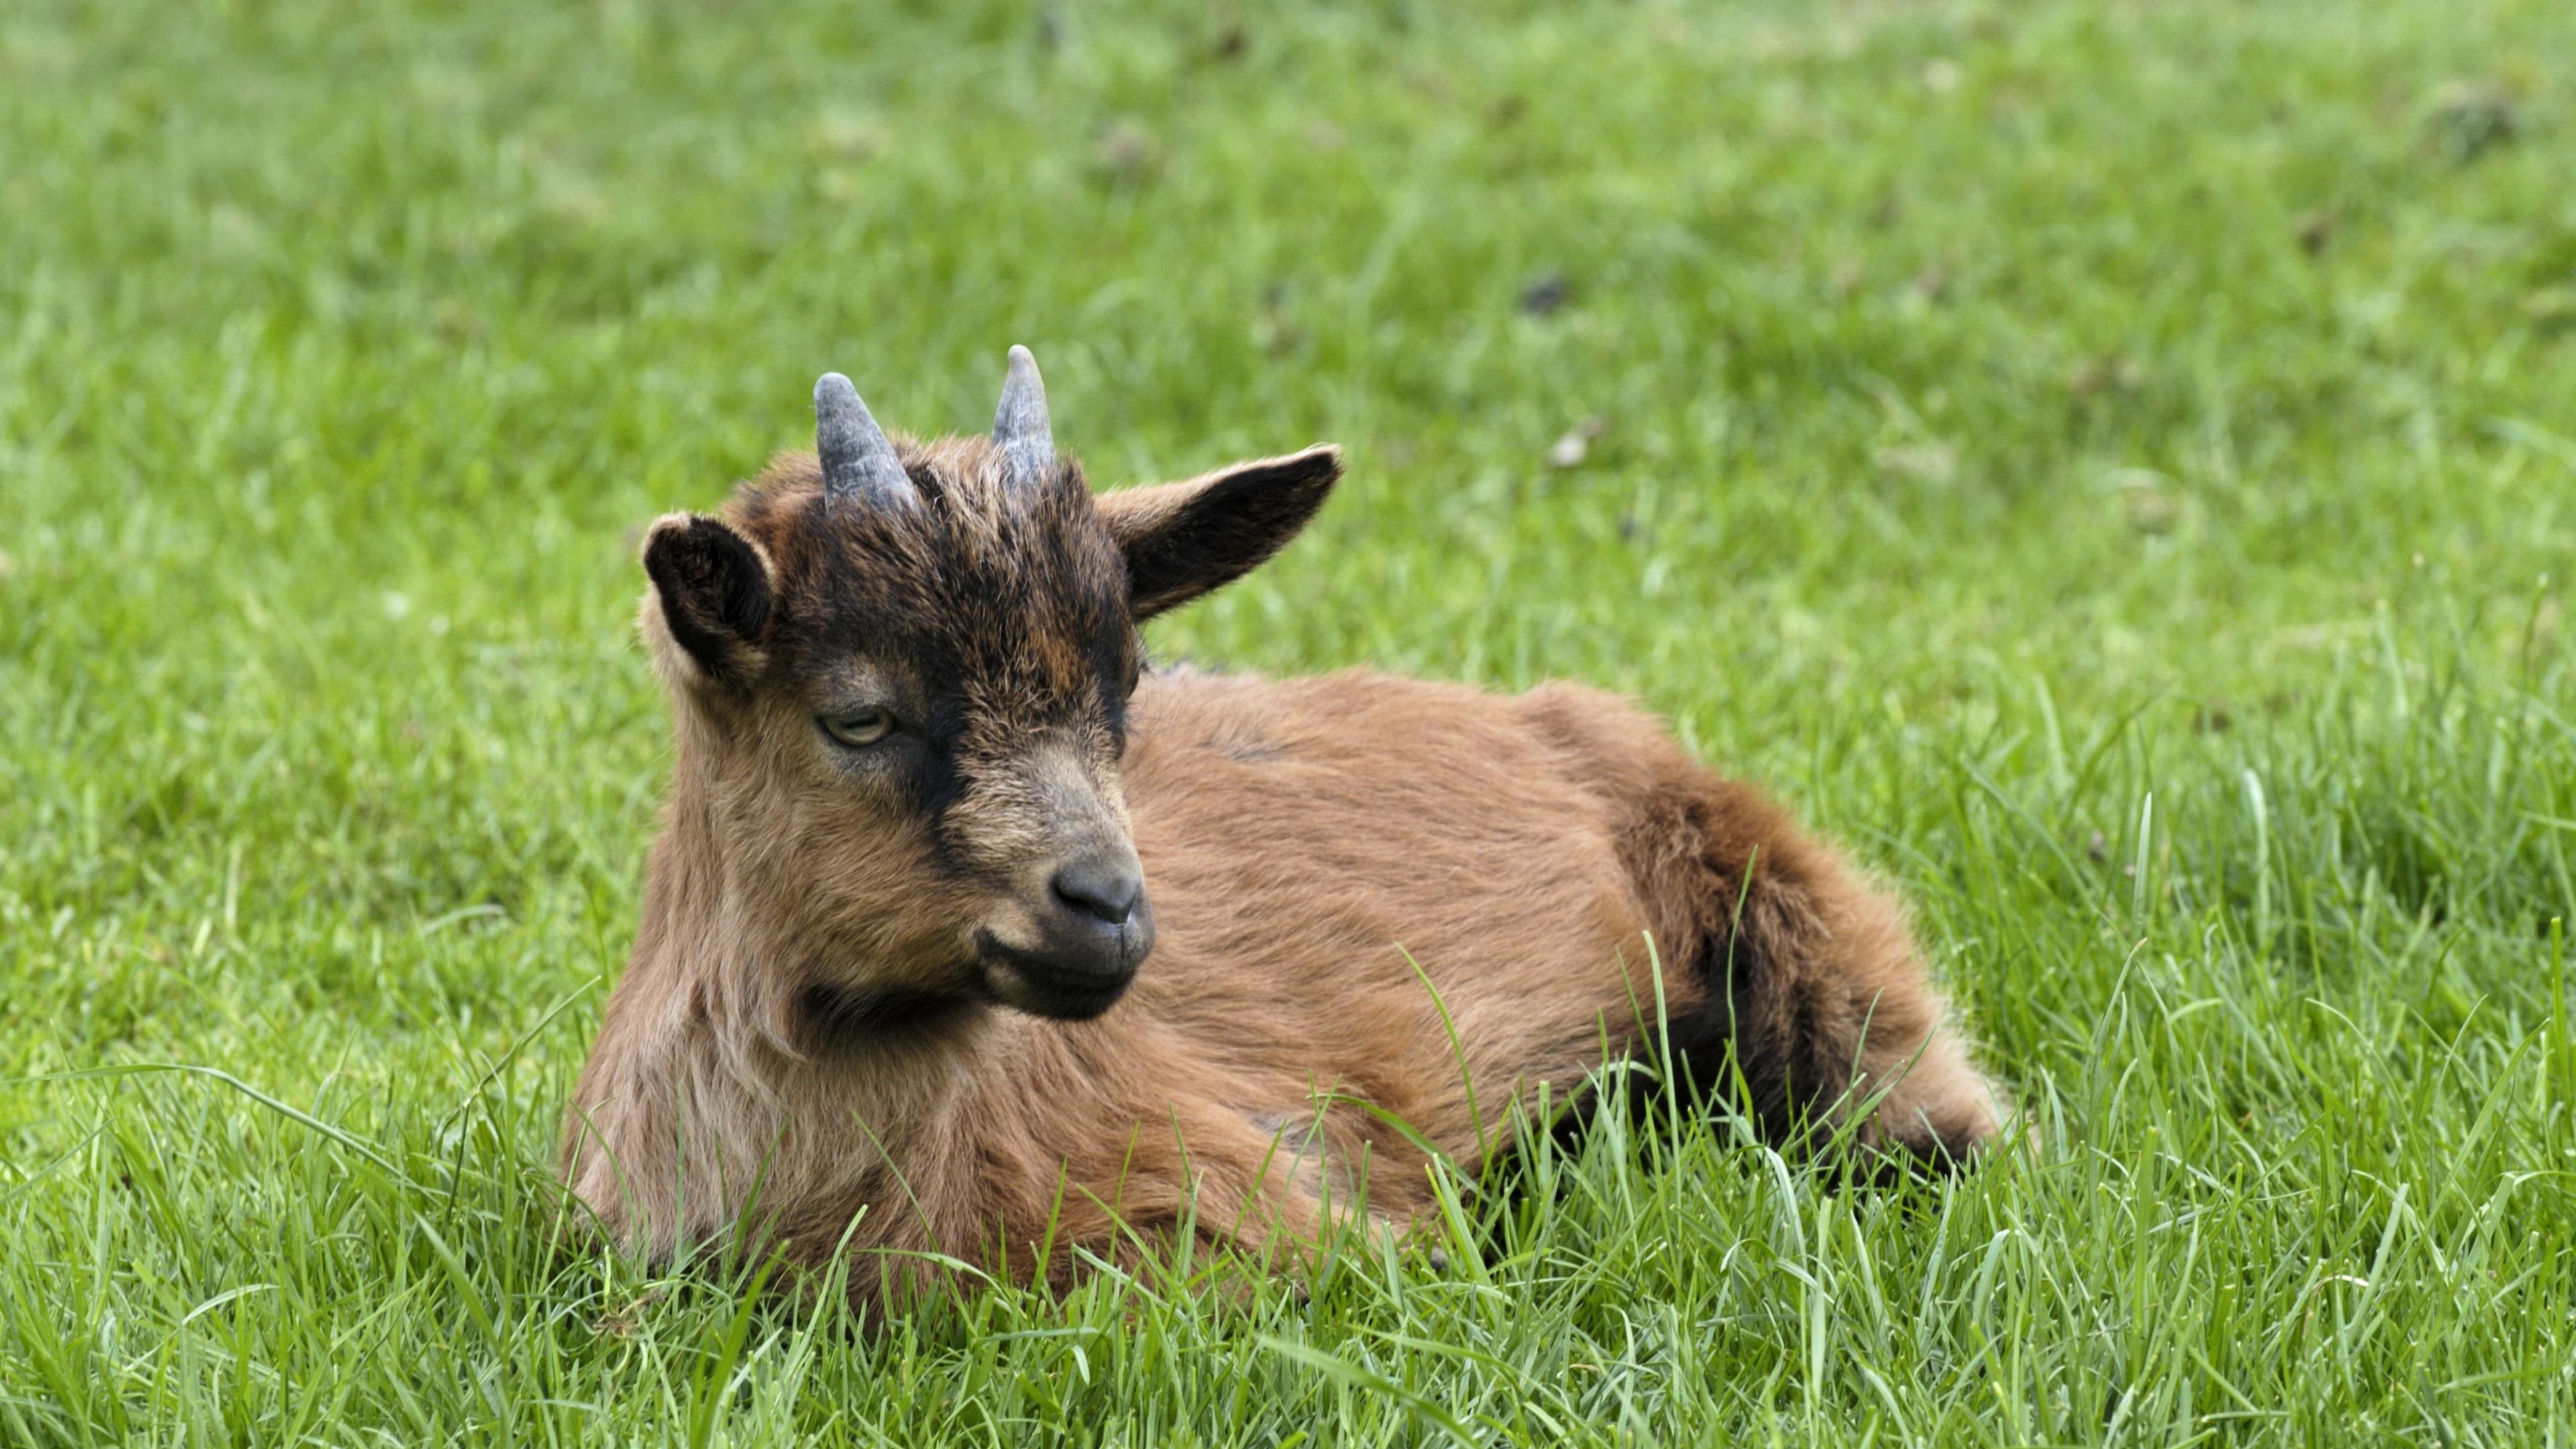 goat horns grass 4k 1542242116 - goat, horns, grass 4k - Horns, Grass, goat